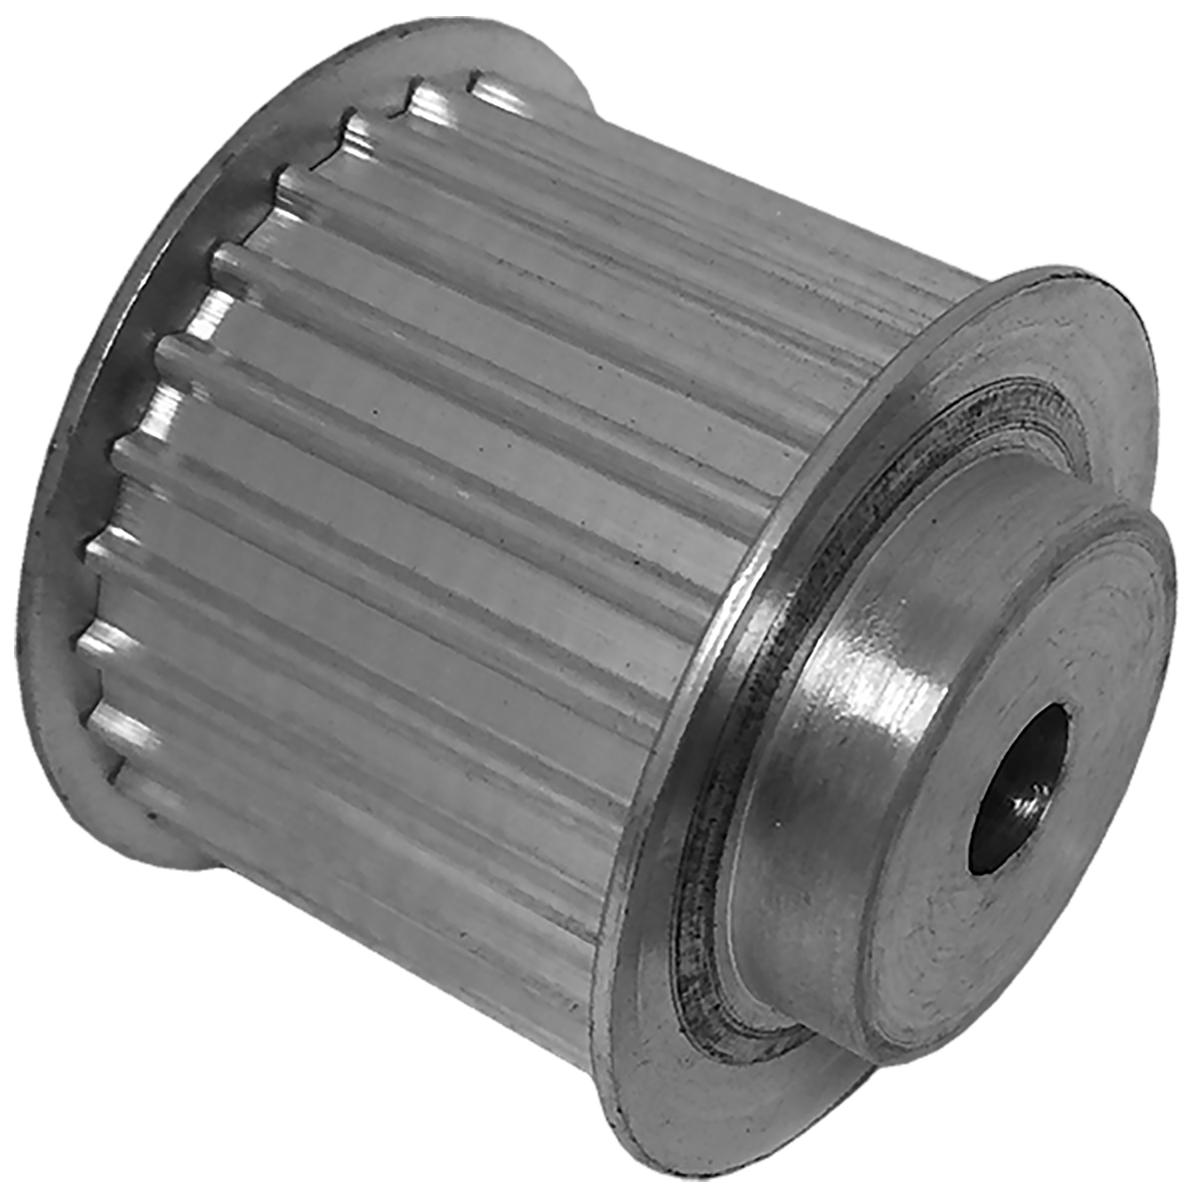 38AT5/25-2 - Aluminum Metric Pulleys